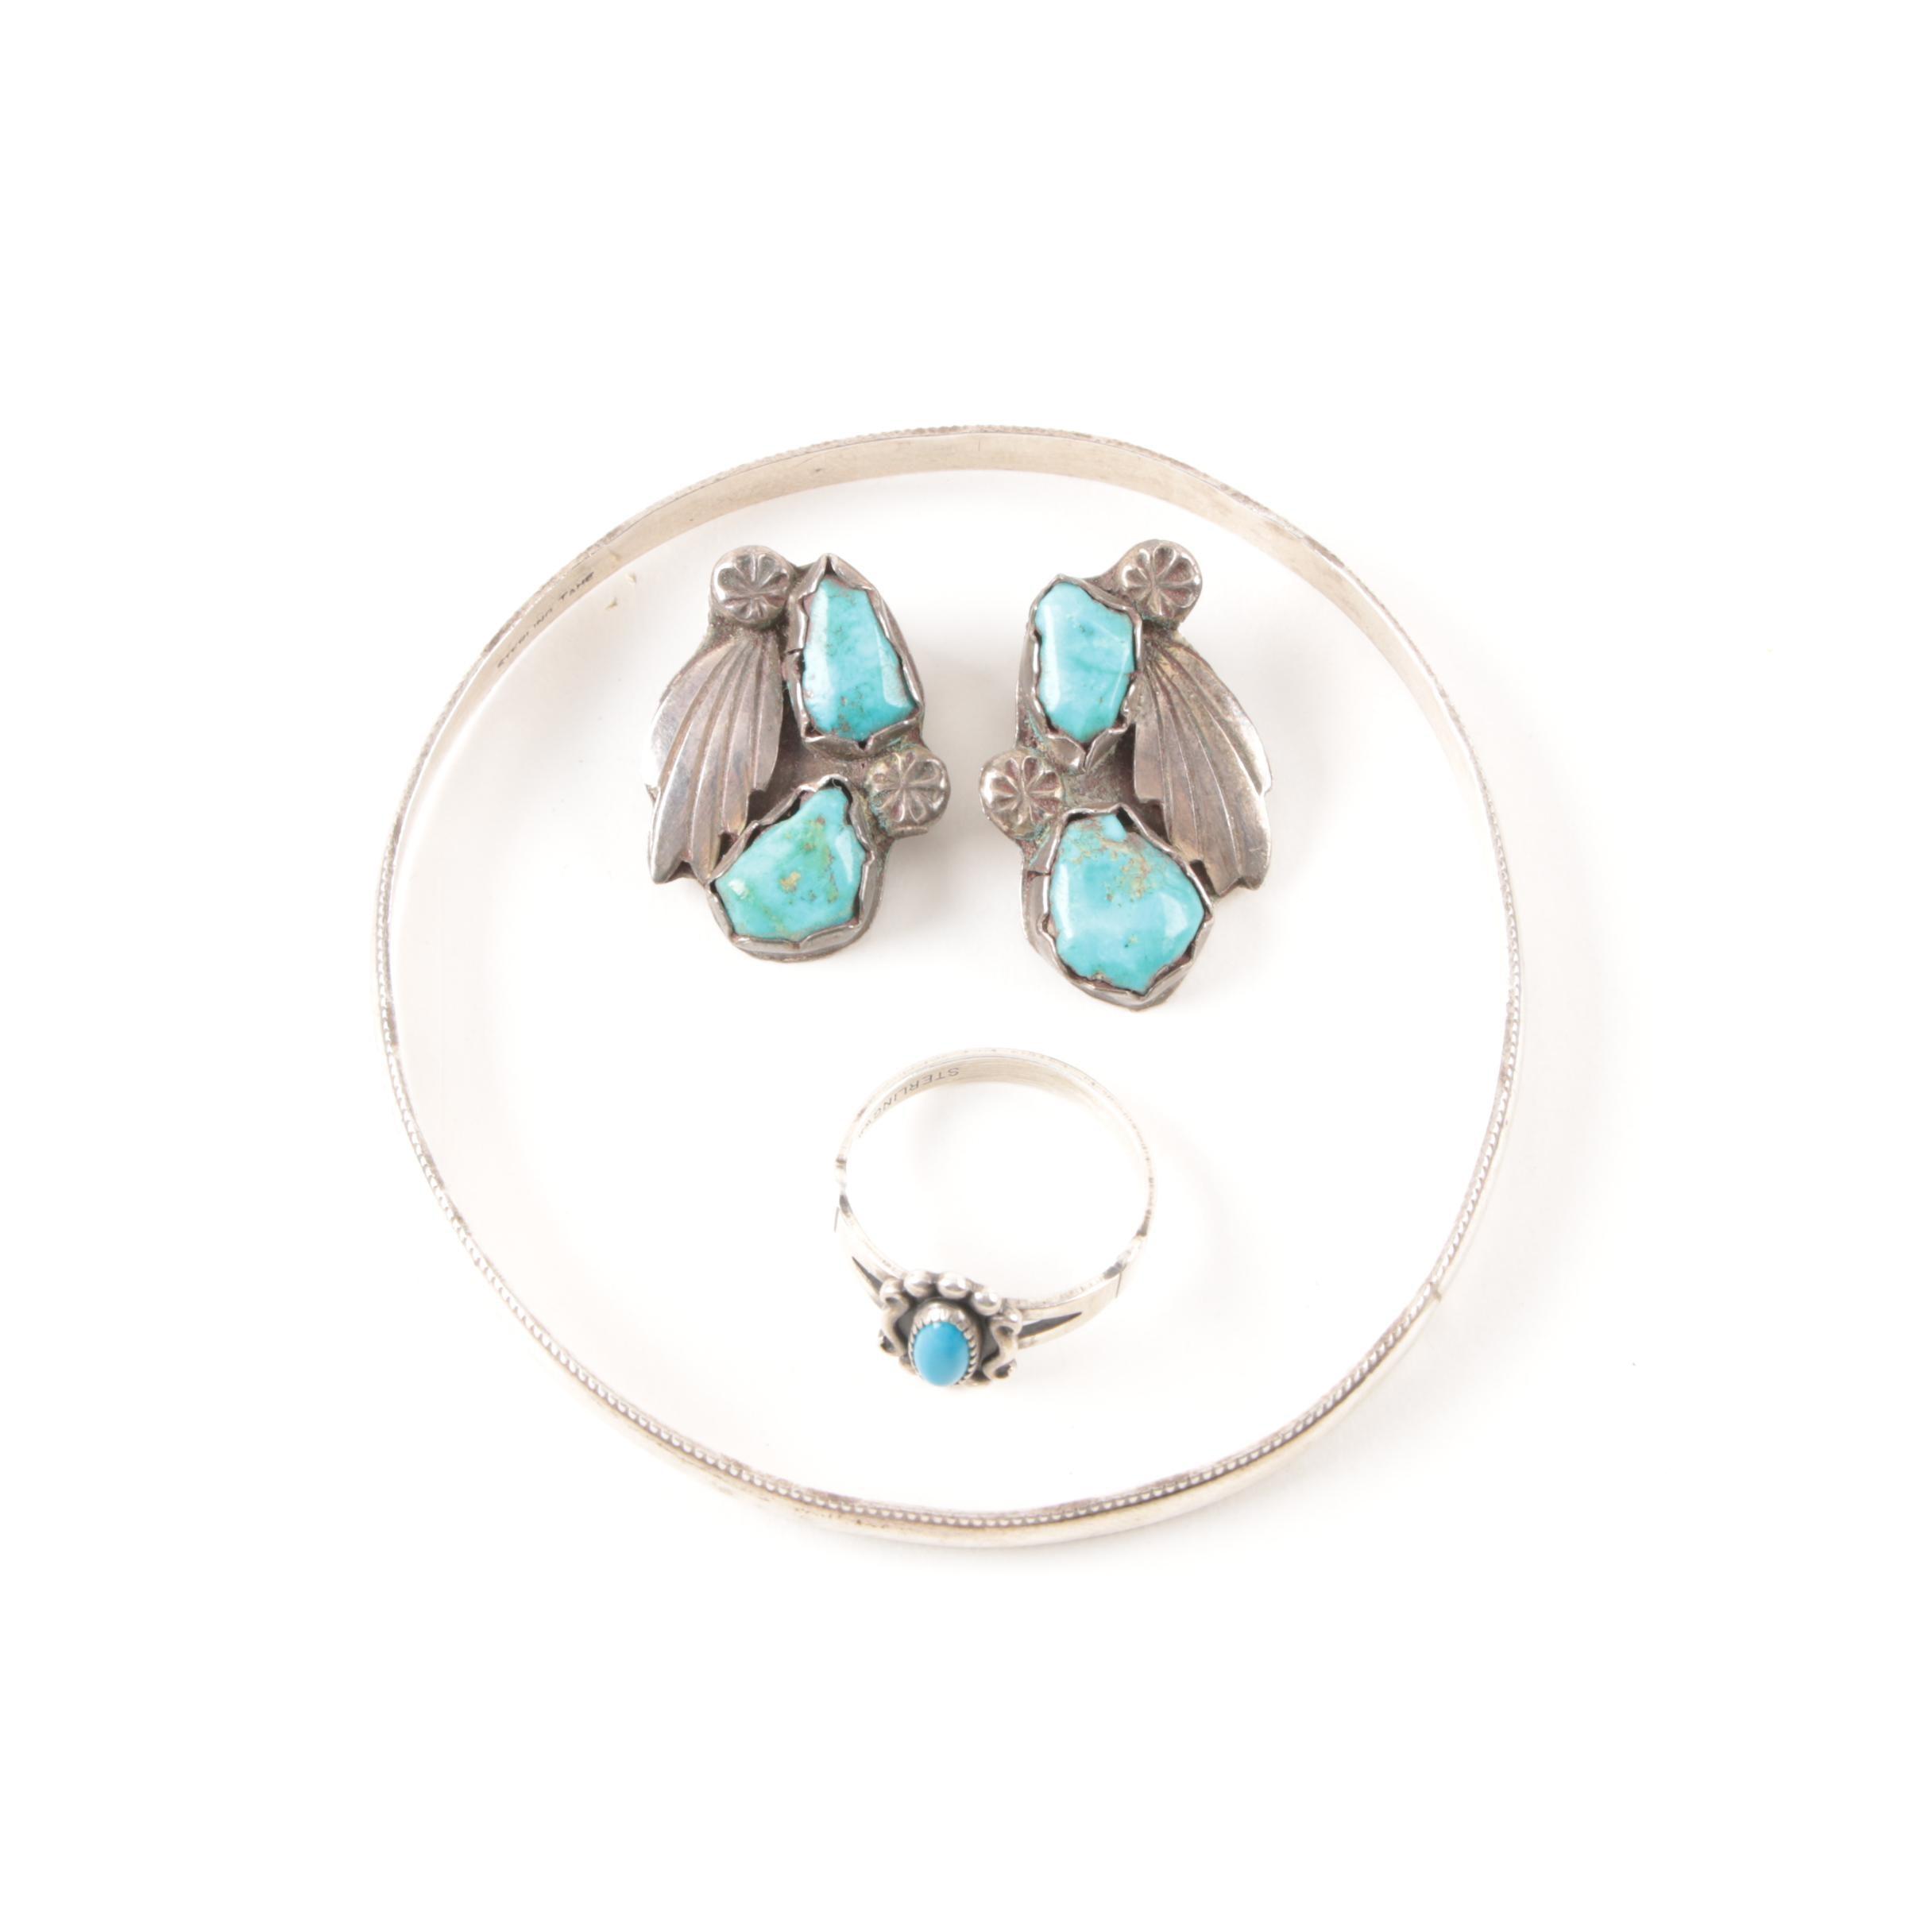 Tahe Navajo Sterling Bangle Bracelet and More